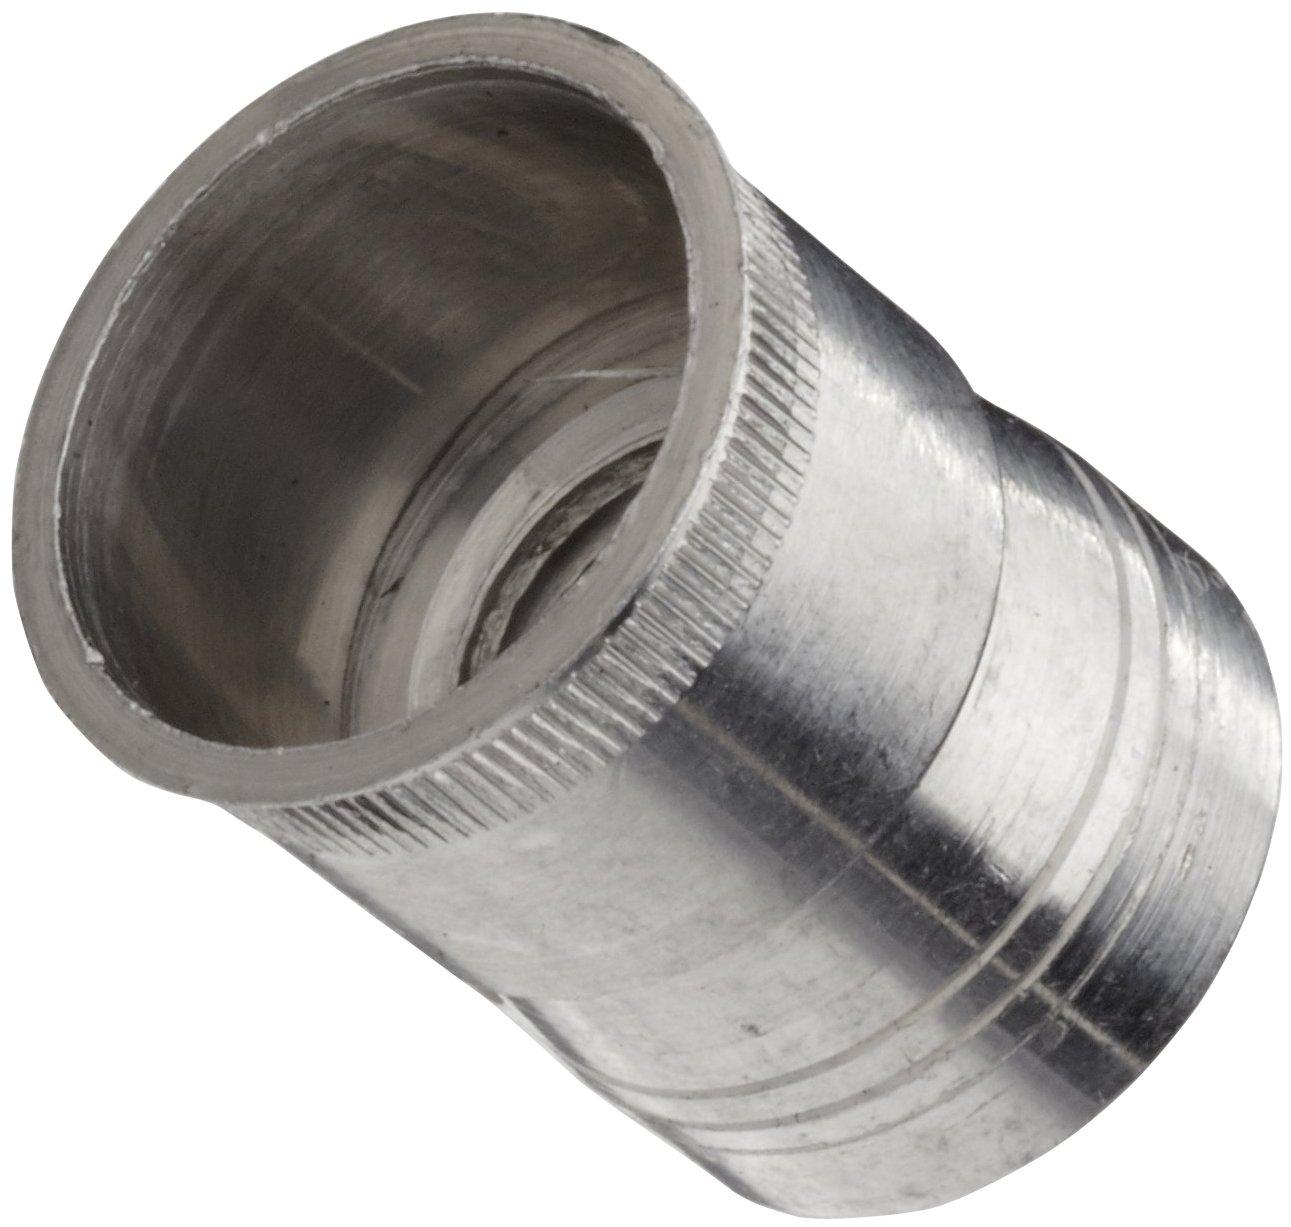 Aluminum Threaded Insert, #10-24 Threads, 0.375